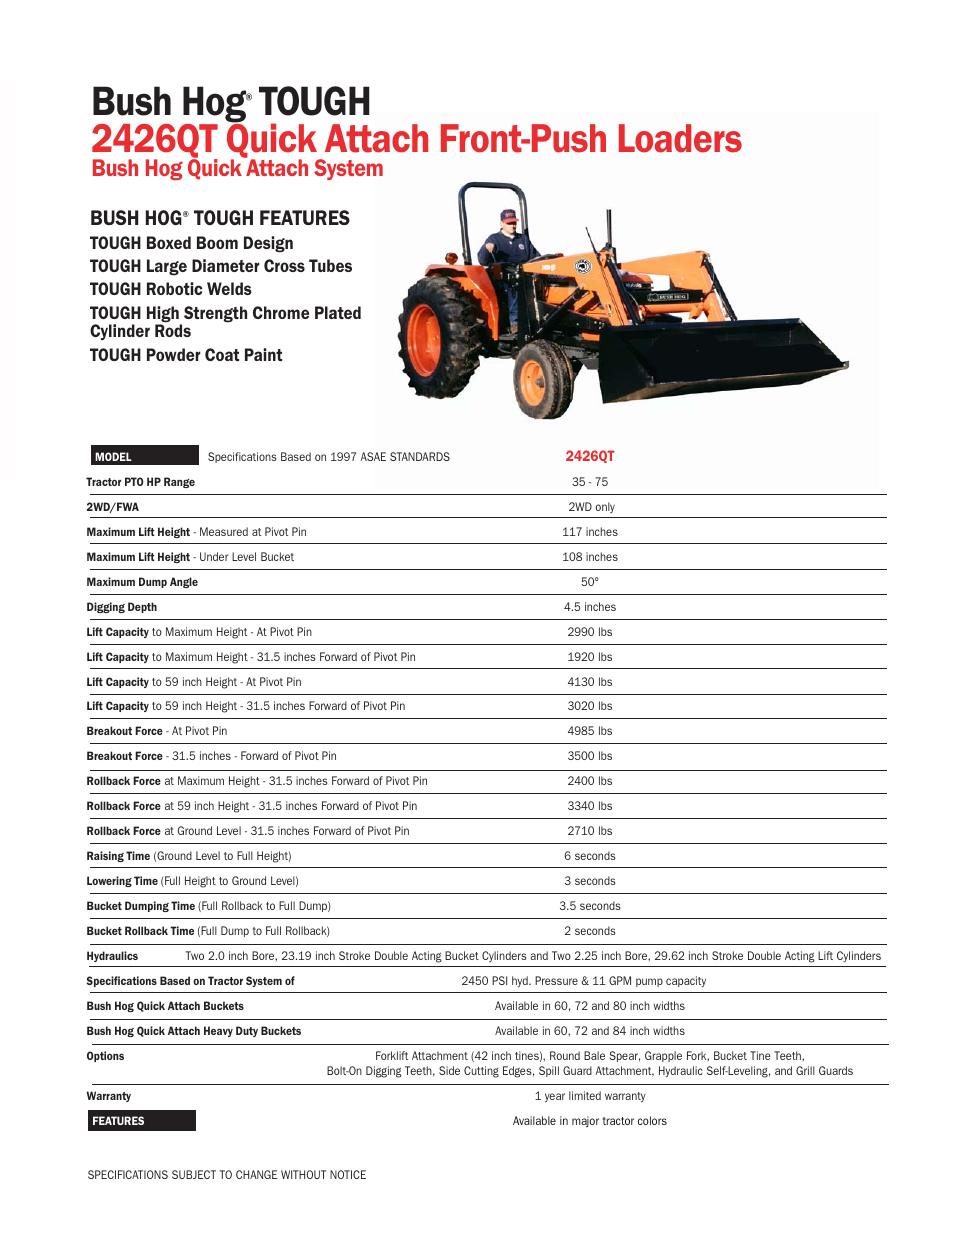 Bush Hog Front-Push Loaders 2426QT User Manual | 1 page